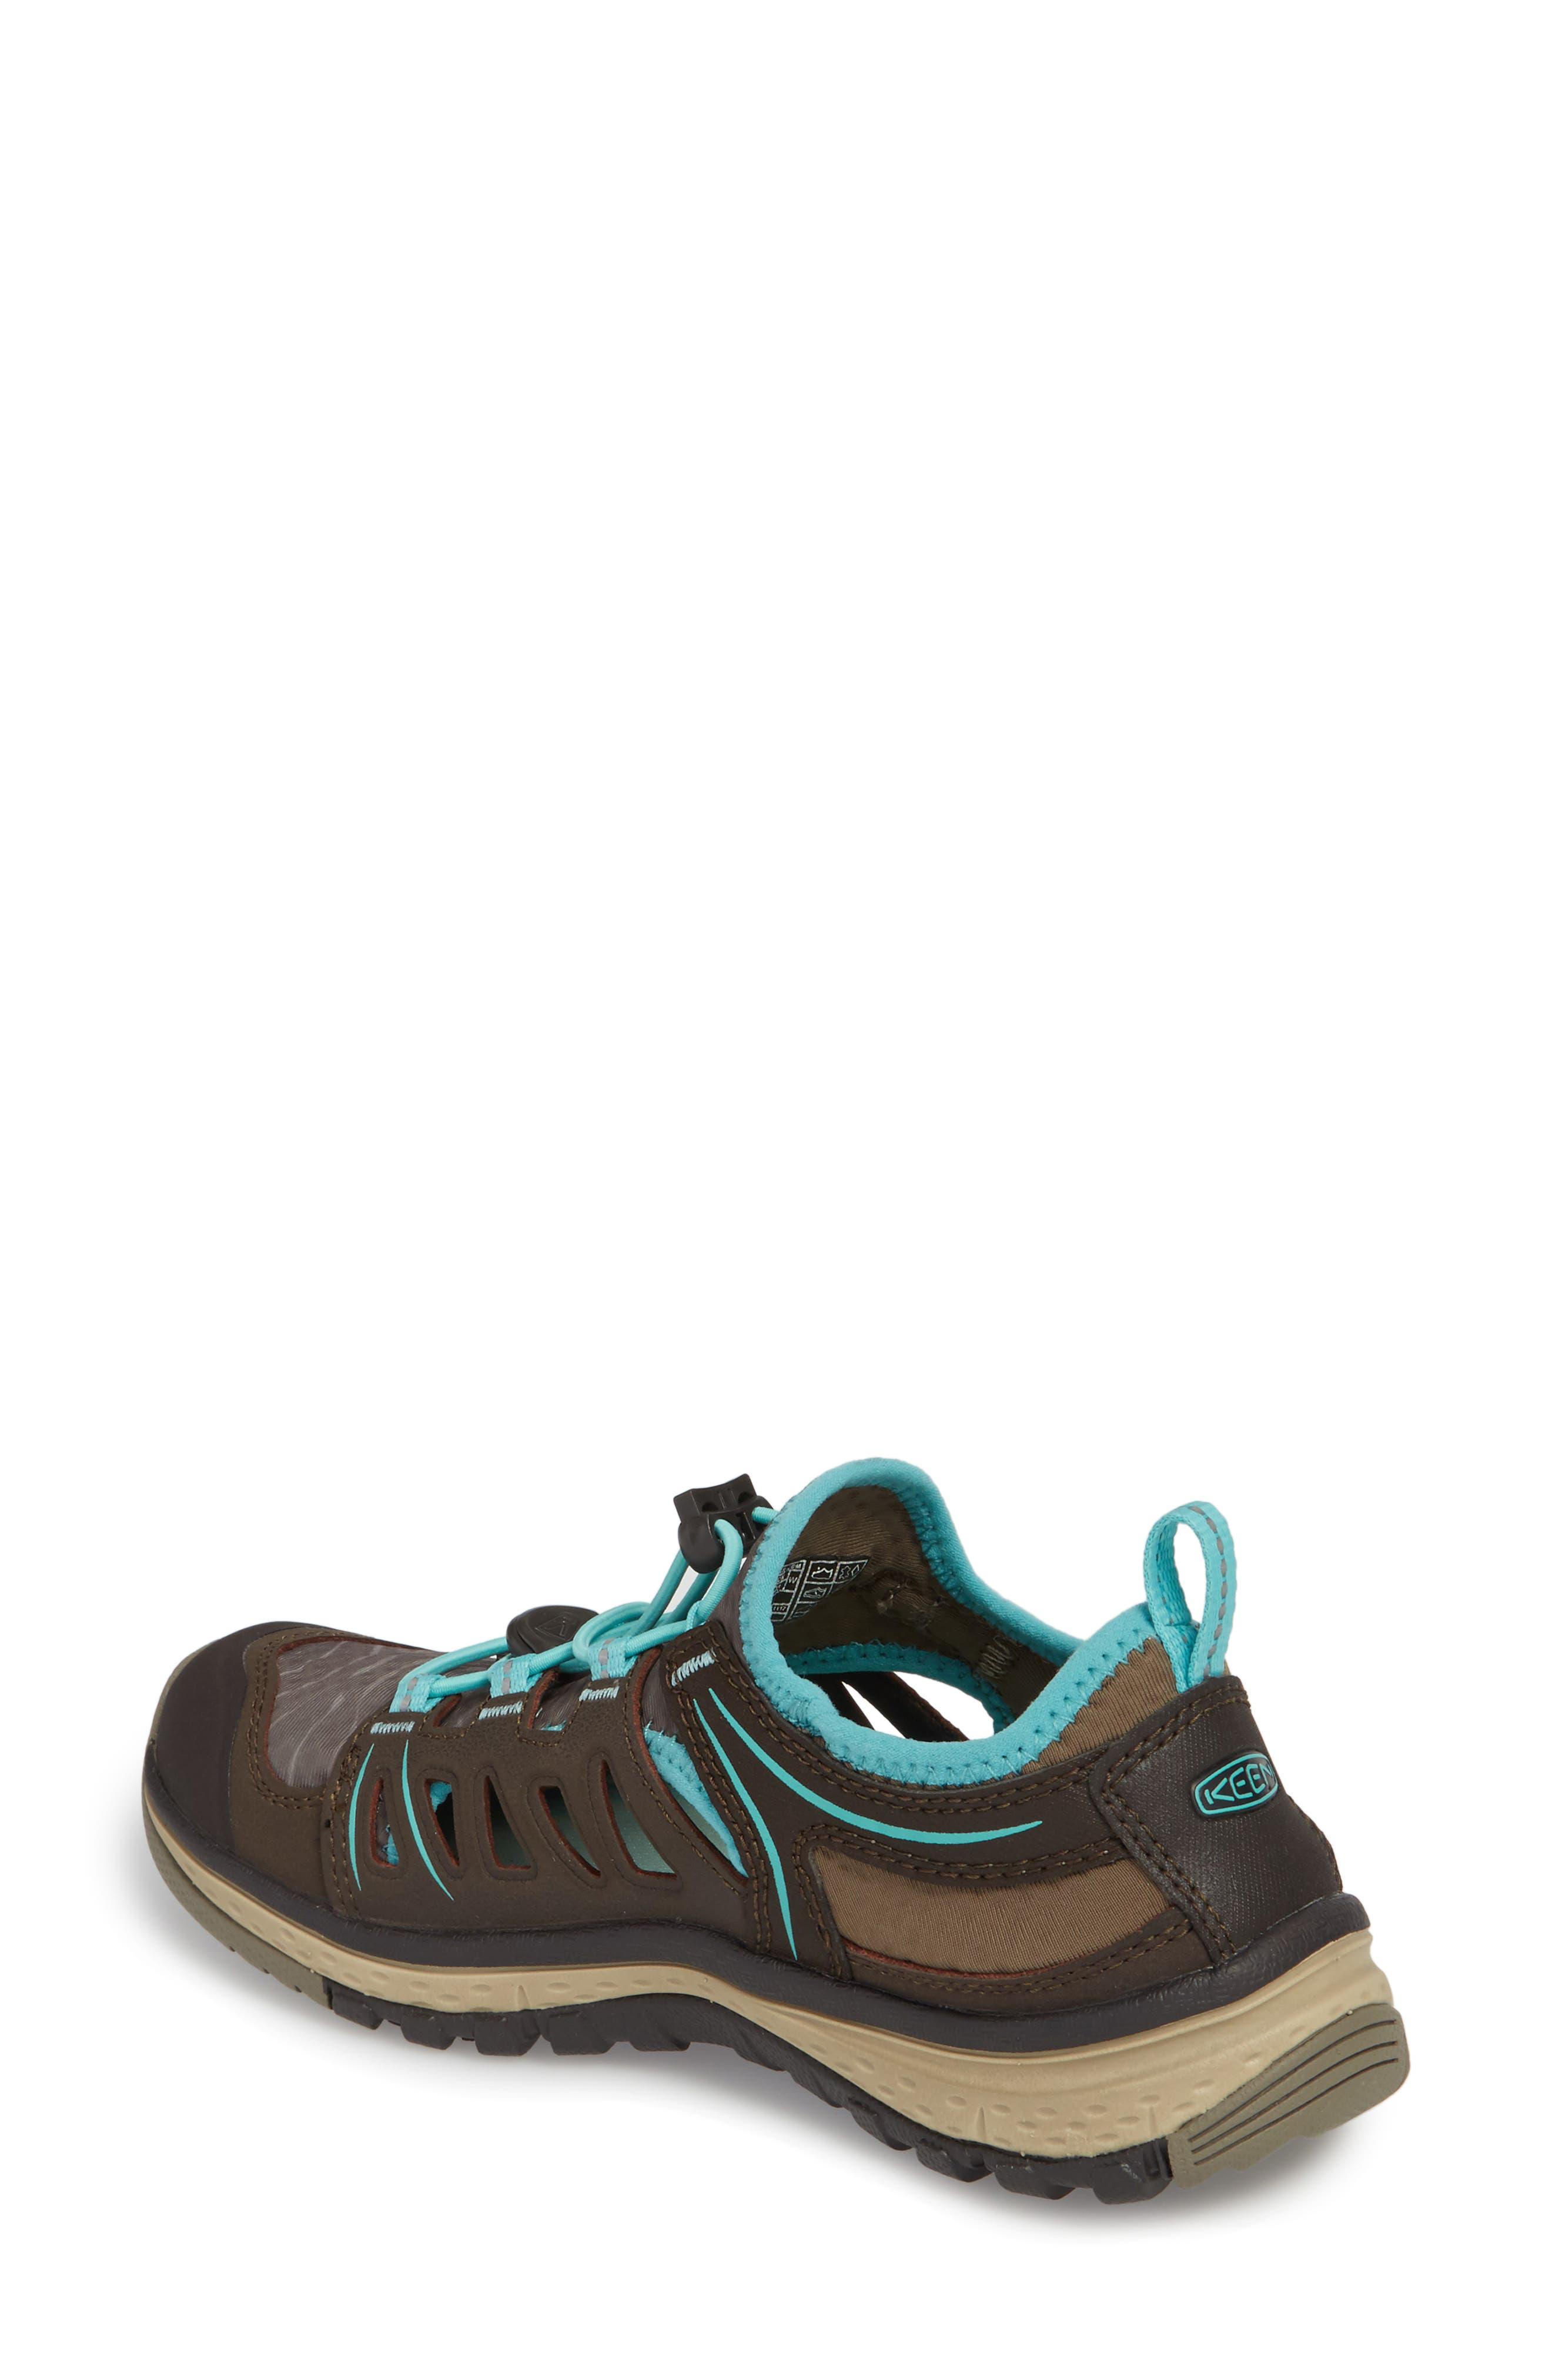 Alternate Image 2  - Keen Terradora Ethos Hiking Sneaker (Women)